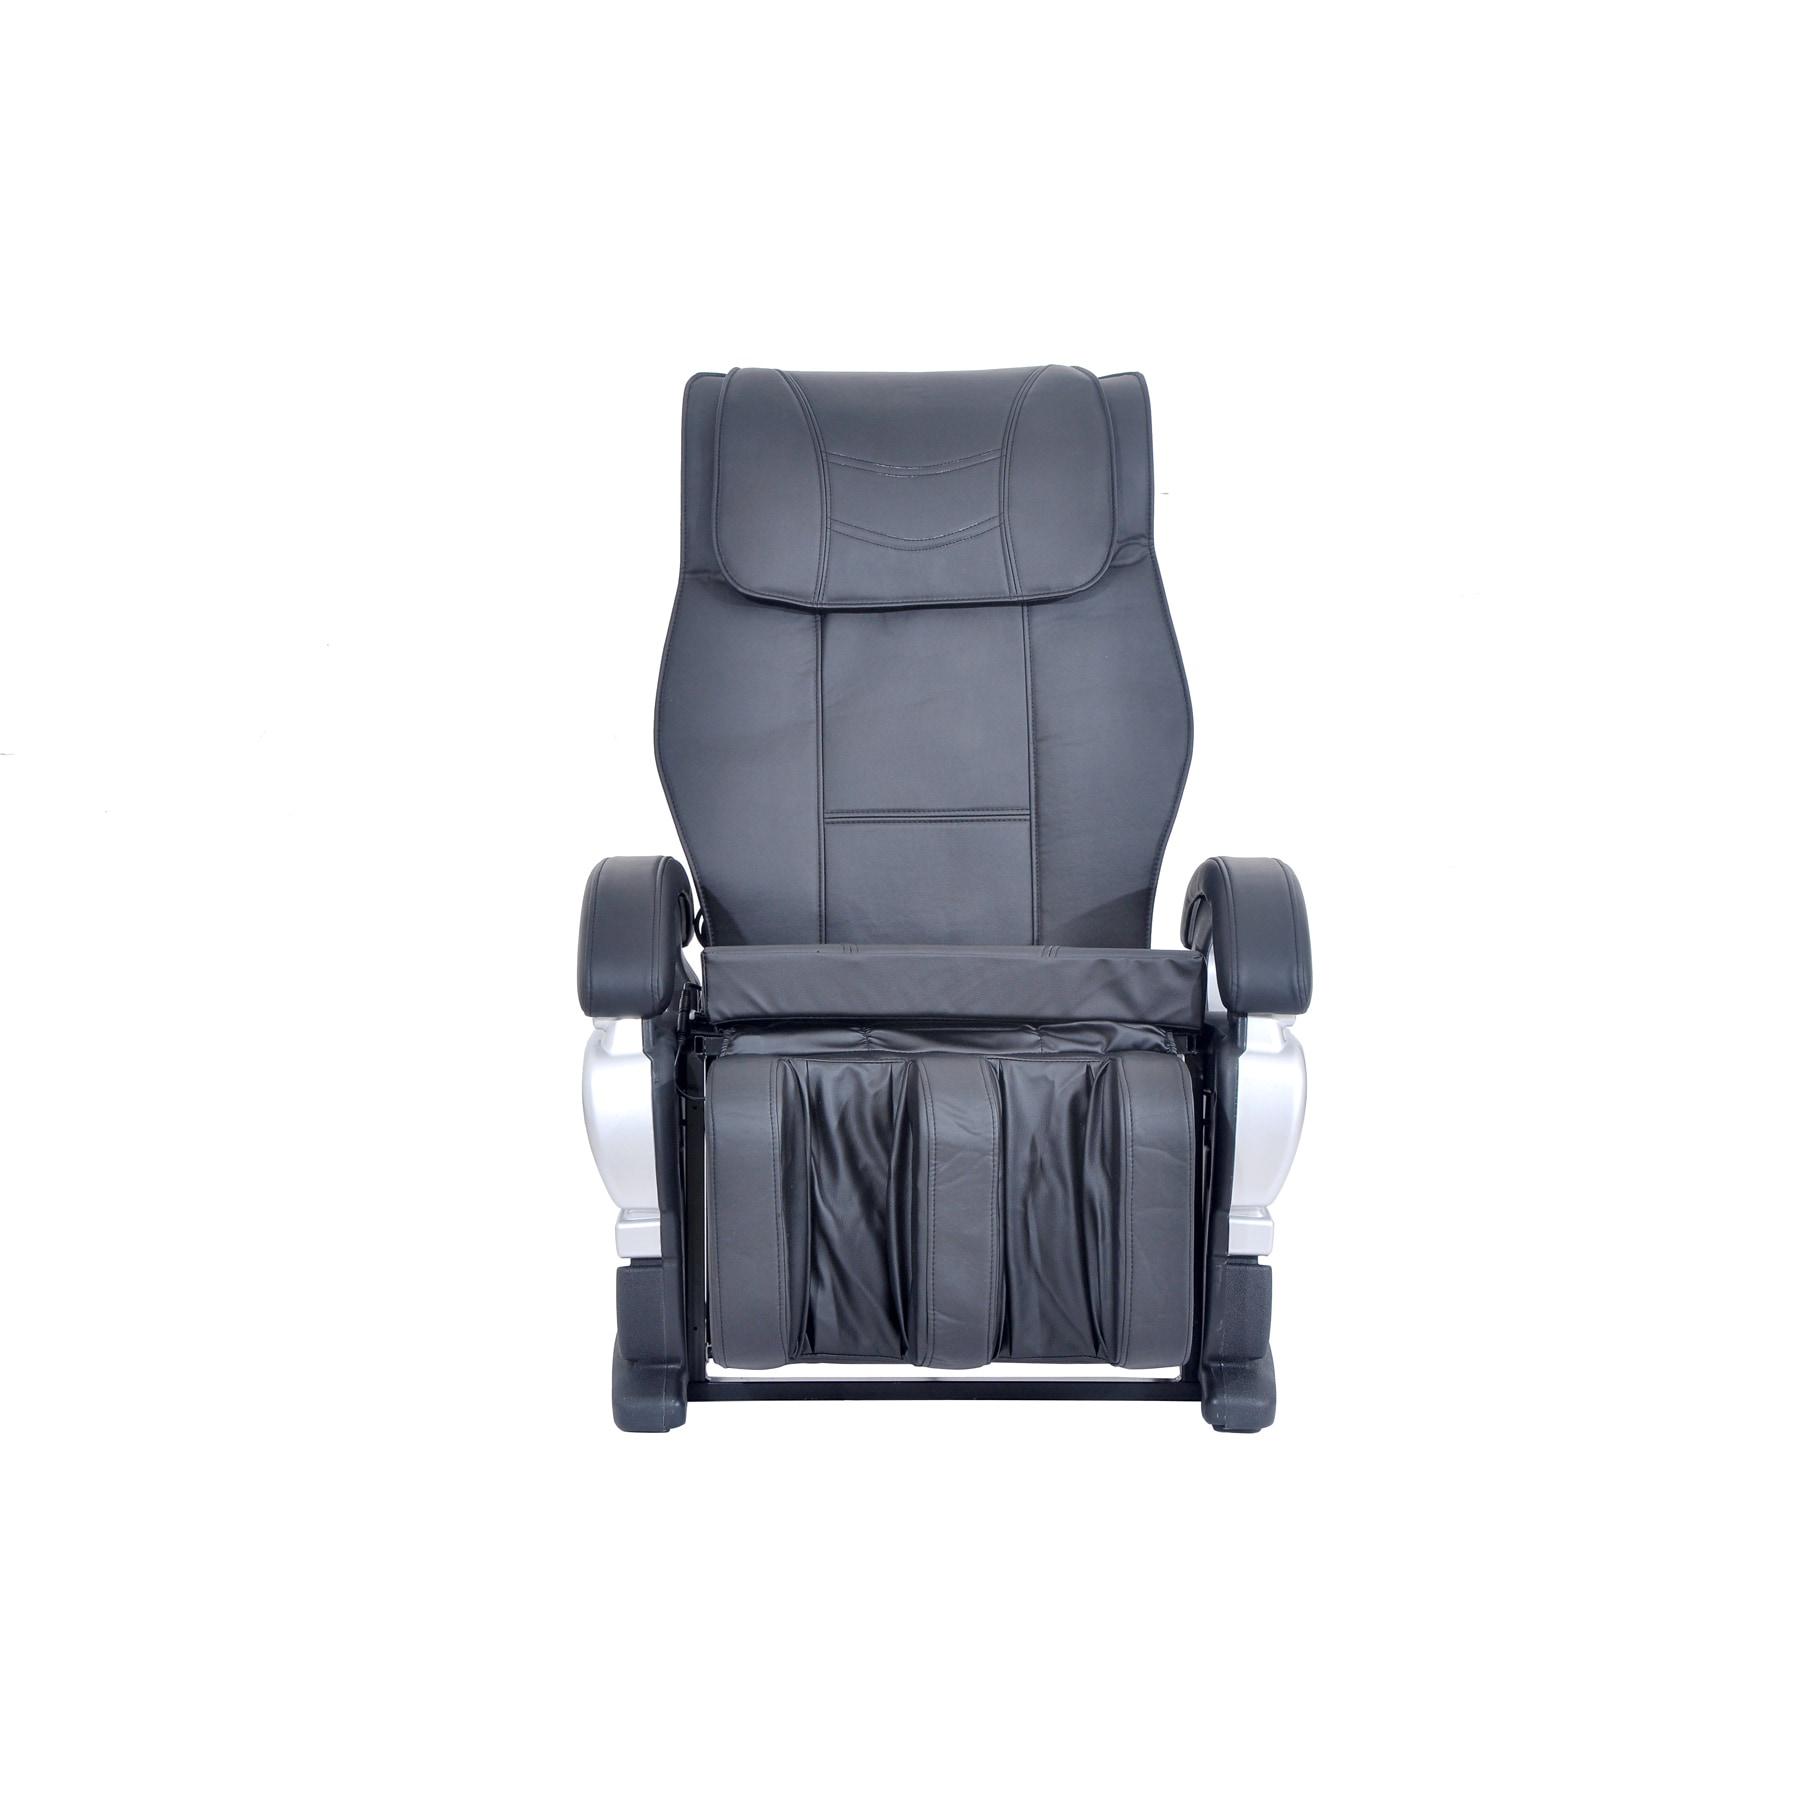 Mcombo Electric Full Body Shiatsu Massage Chair